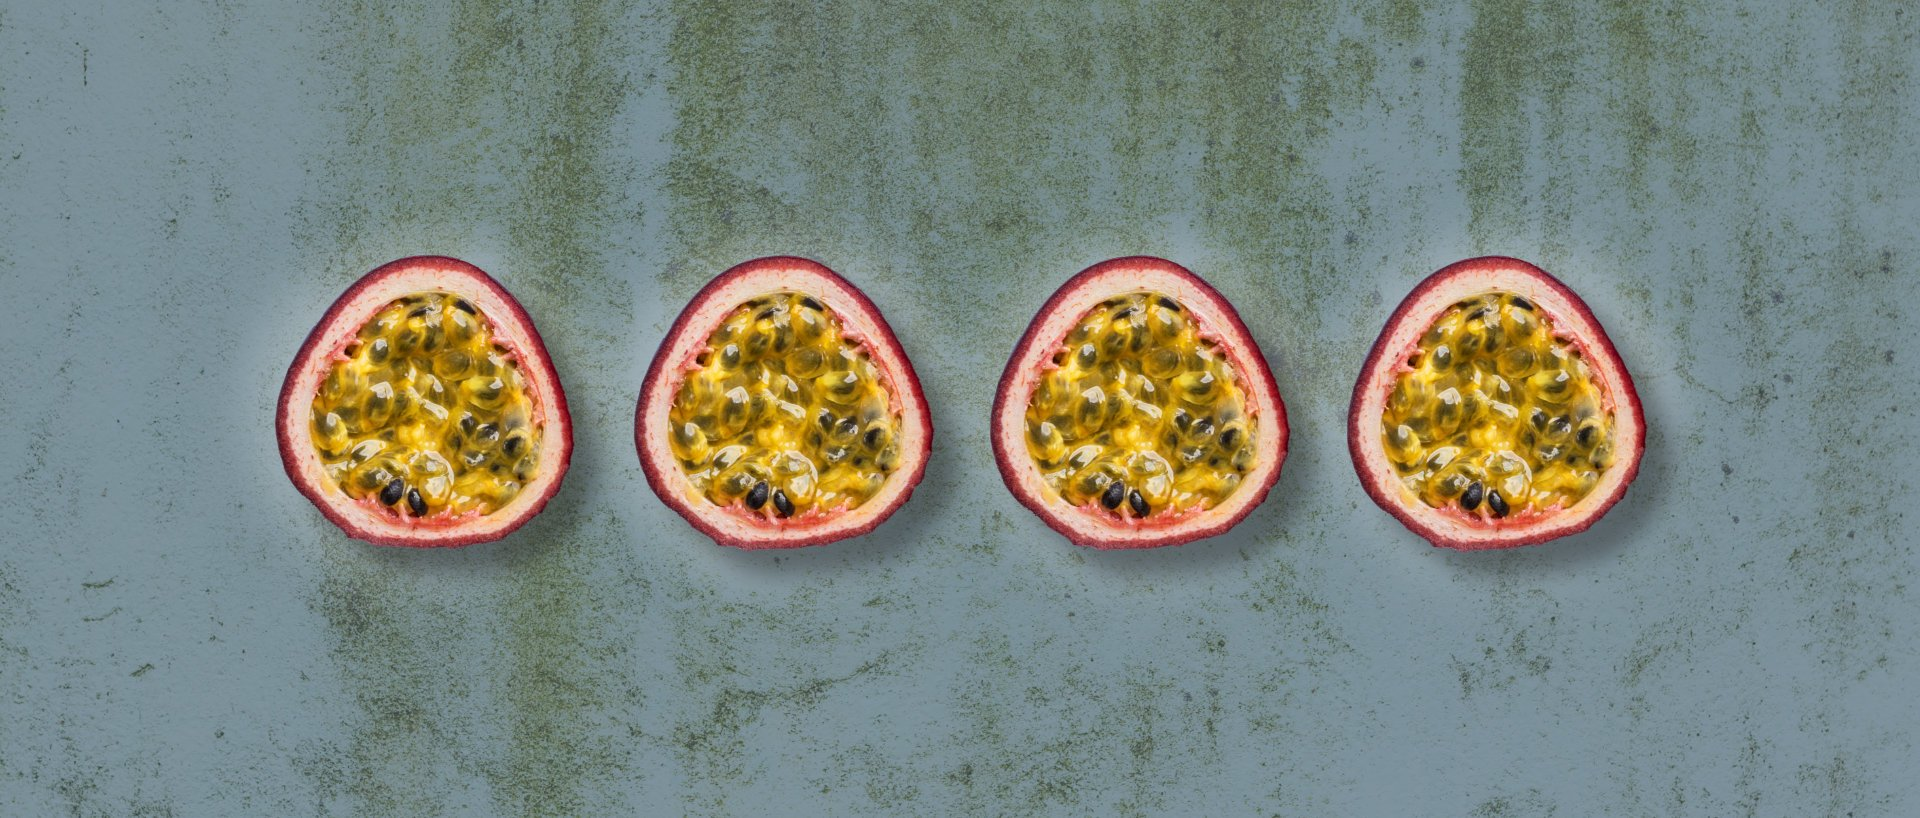 Organic Passion Fruits for Lemonade